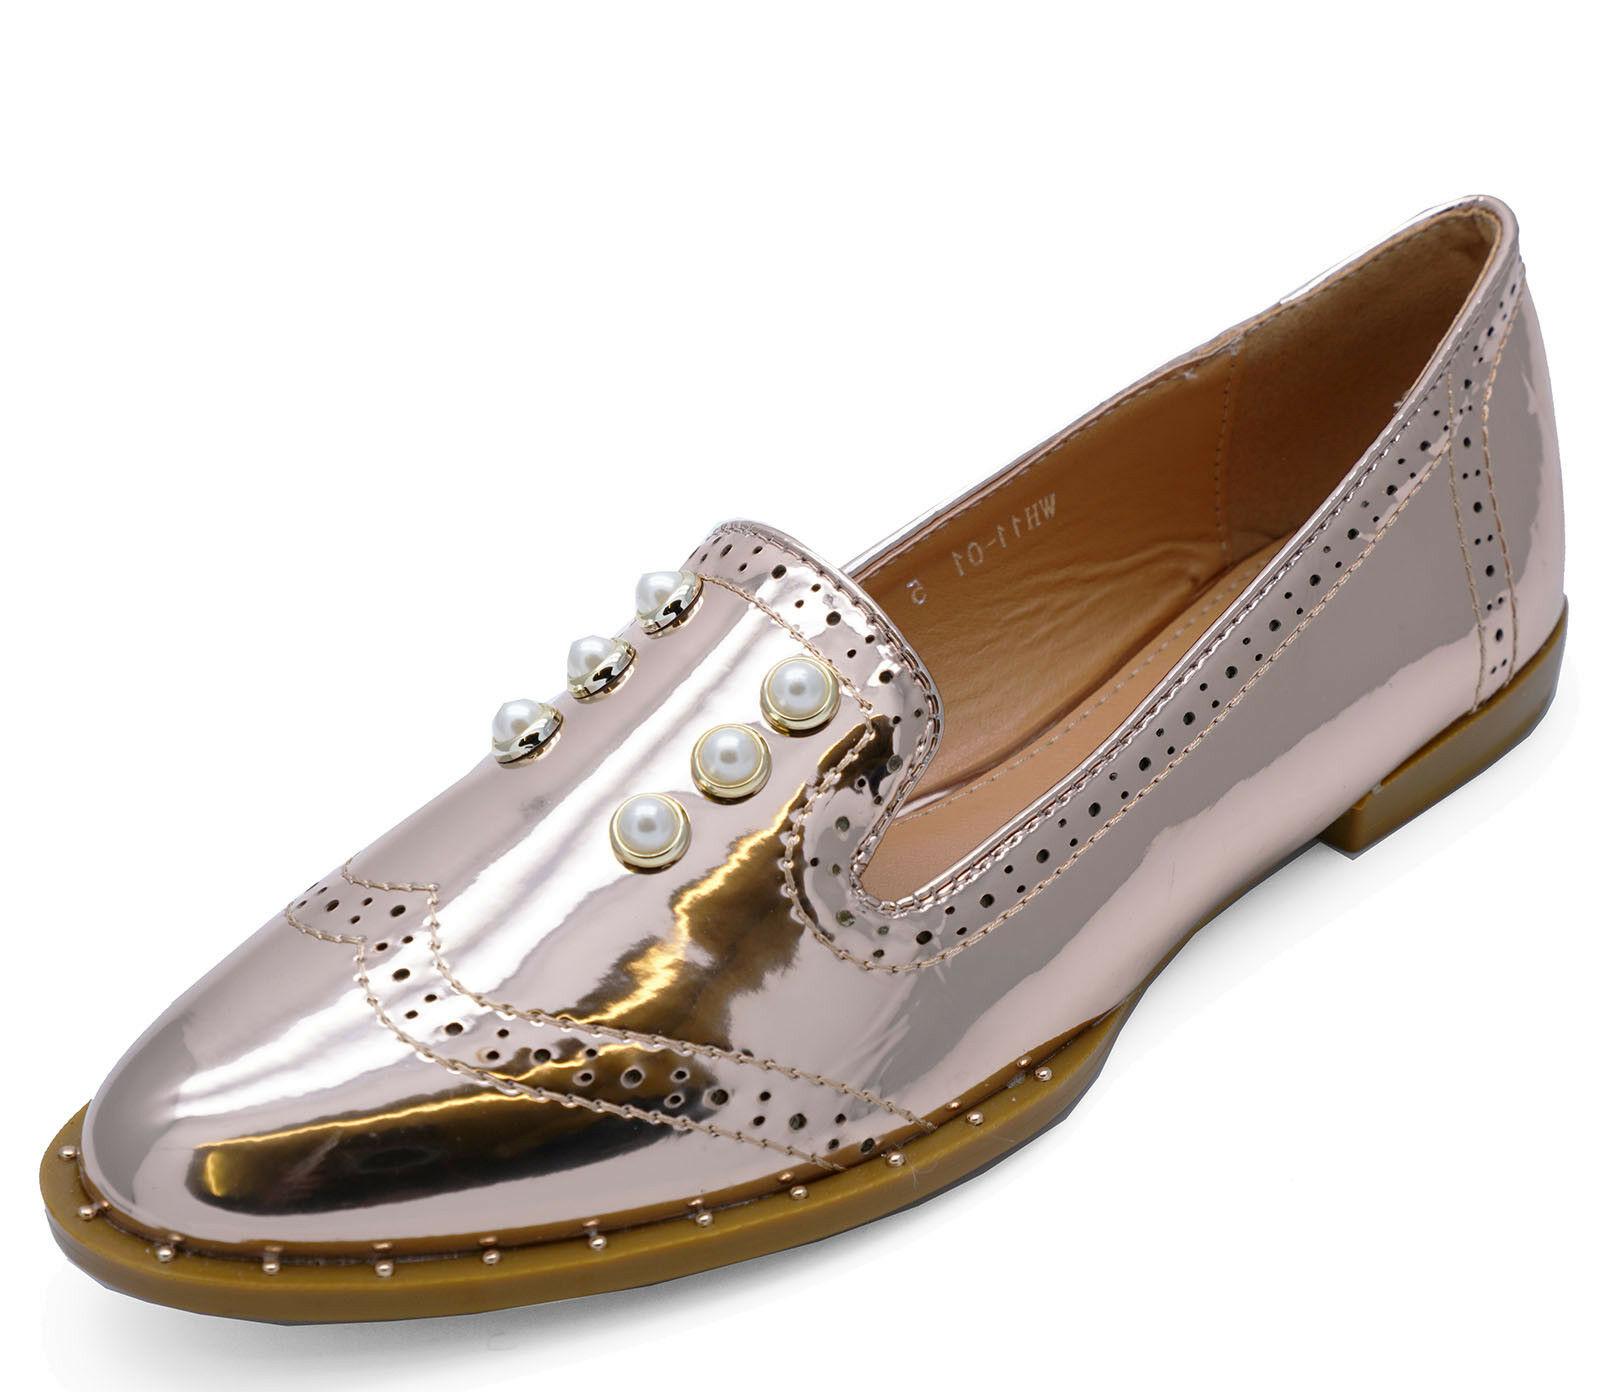 WOMENS ROSE GOLD PATENT FLAT COMFY SLIP-ON LOAFERS SMART TASSLE PUMPS SHOES 3-8